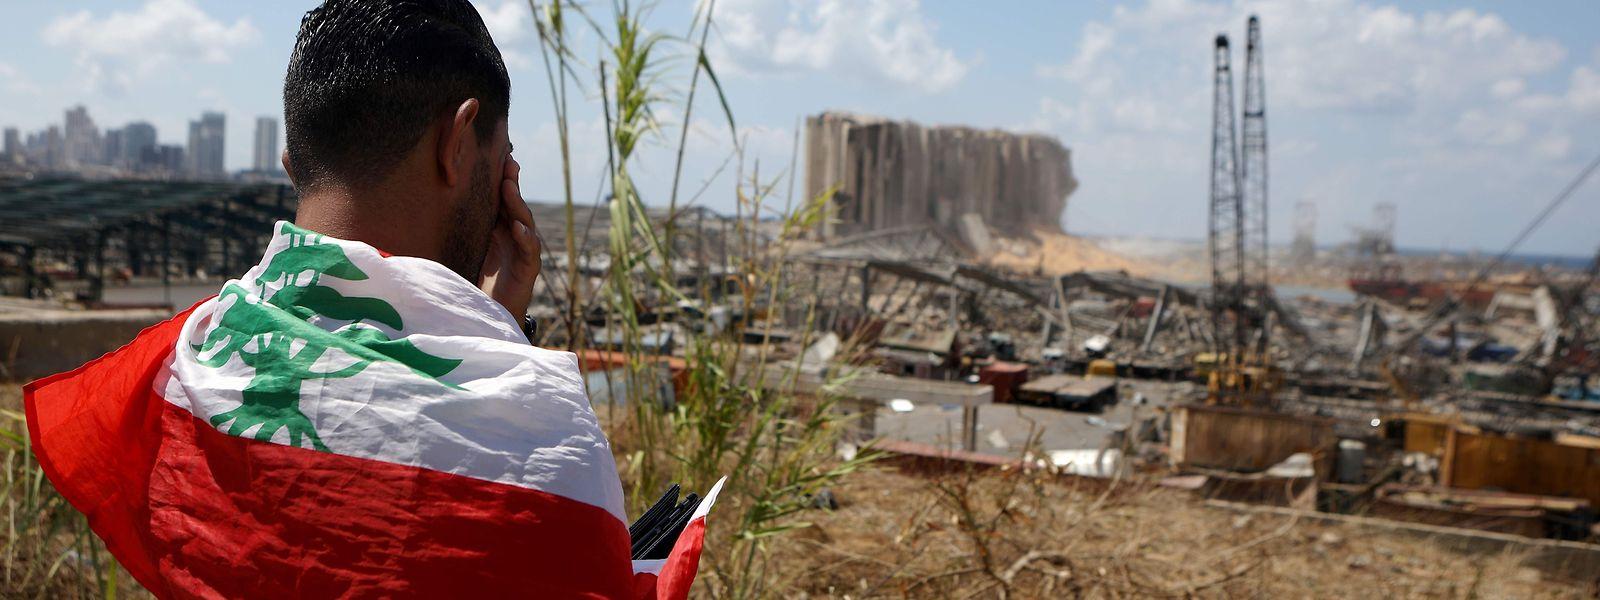 Die Lage im Libanon ist katastrophal.